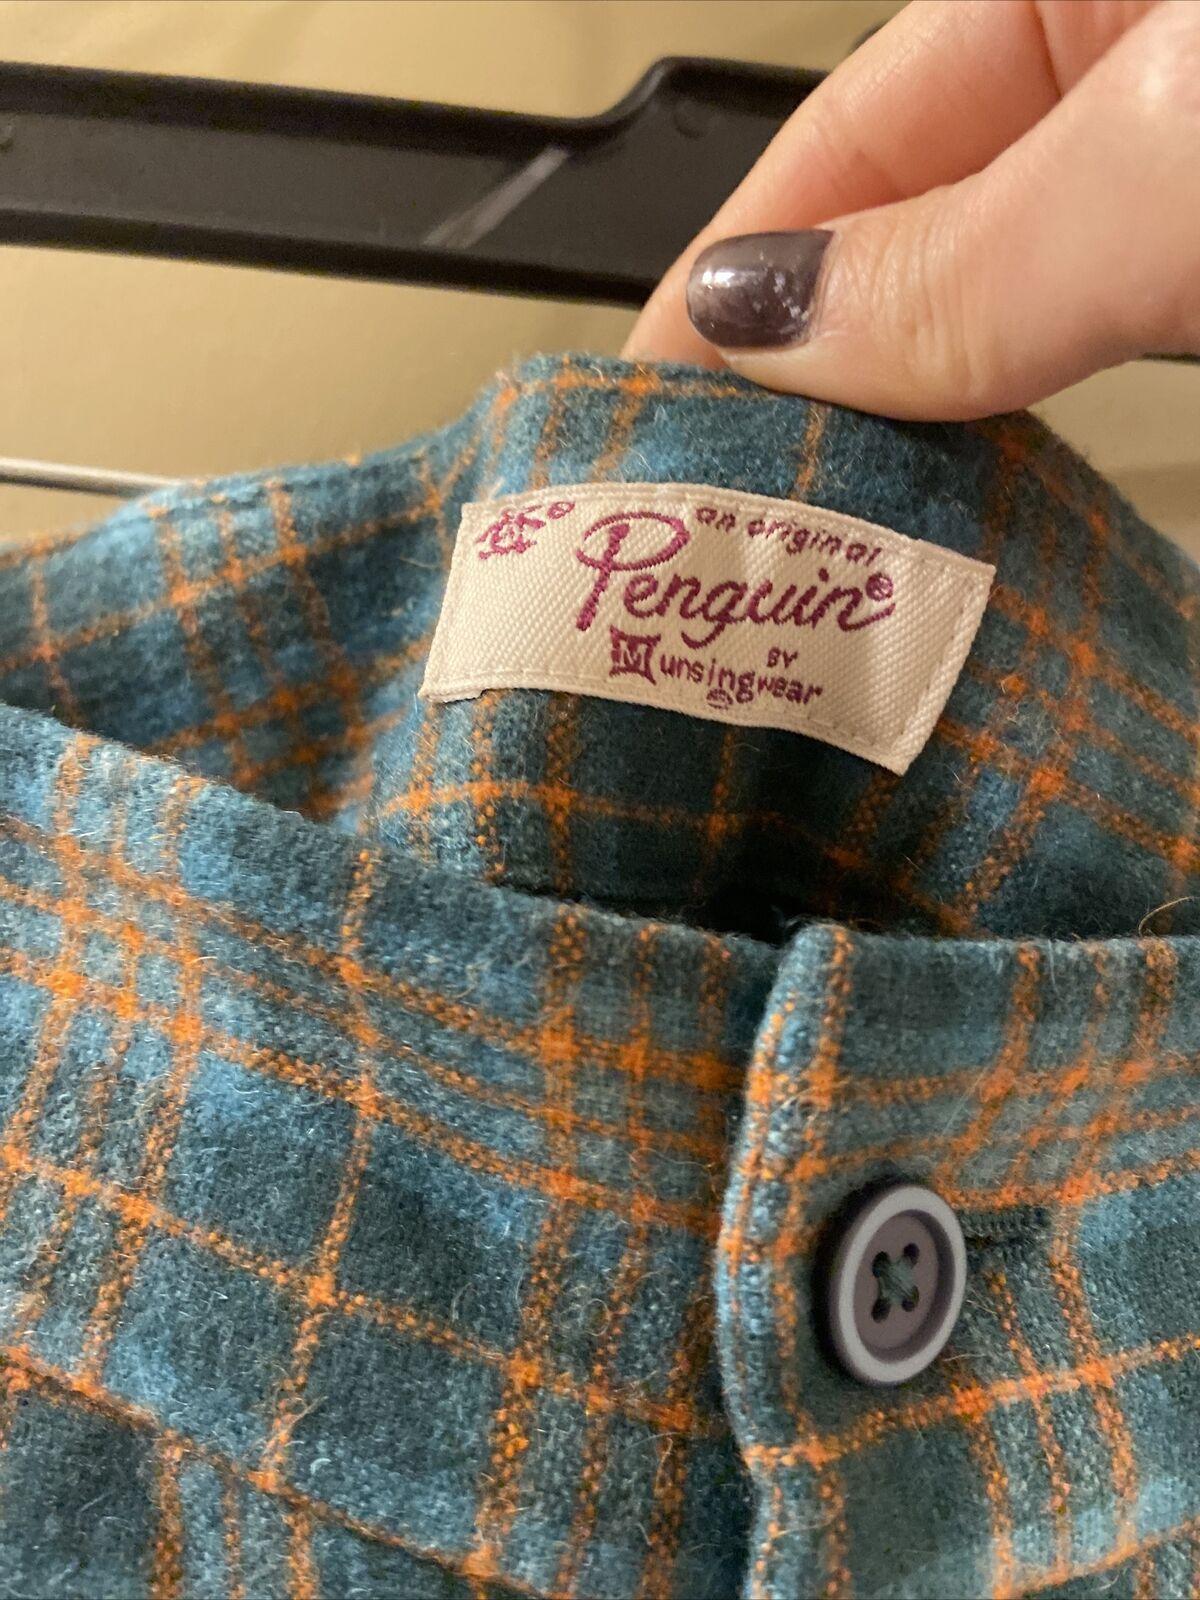 Penguin Wool Green Plaid Pants Sz 0 (item 9.8) - image 5